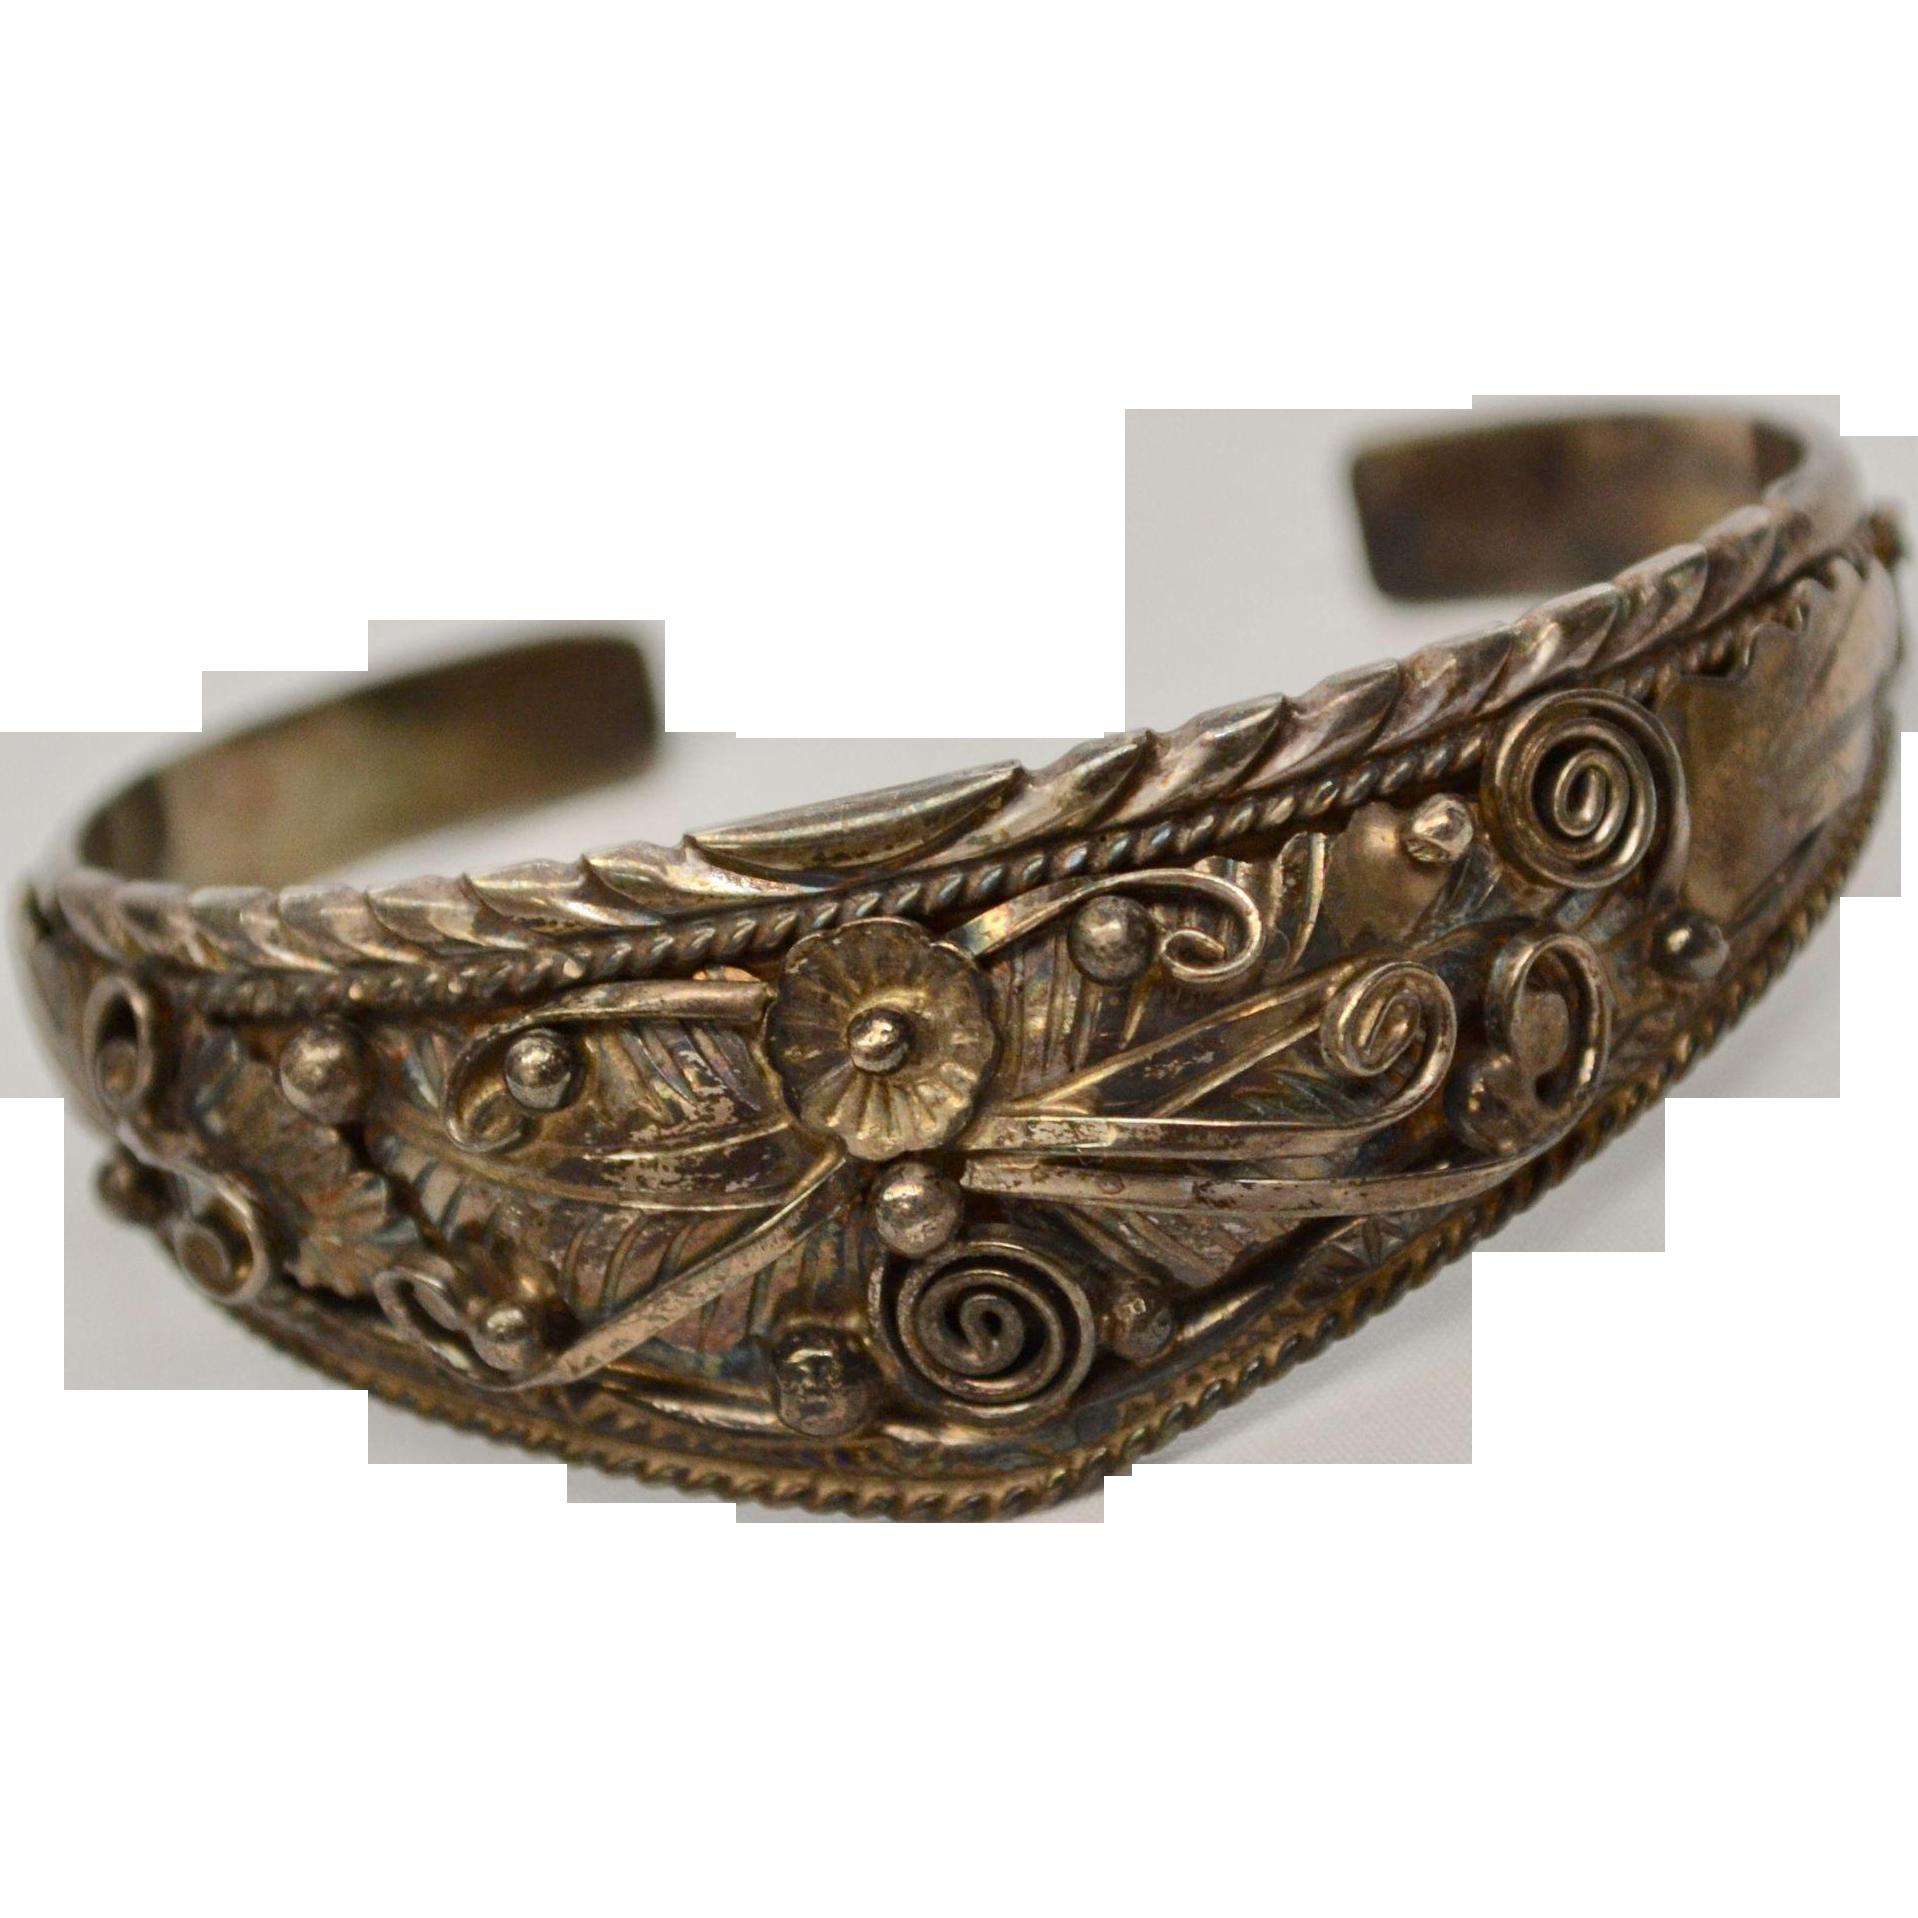 Signed Navajo Sterling Silver Cuff Bracelet w/ Ornate Hand Applied Detail